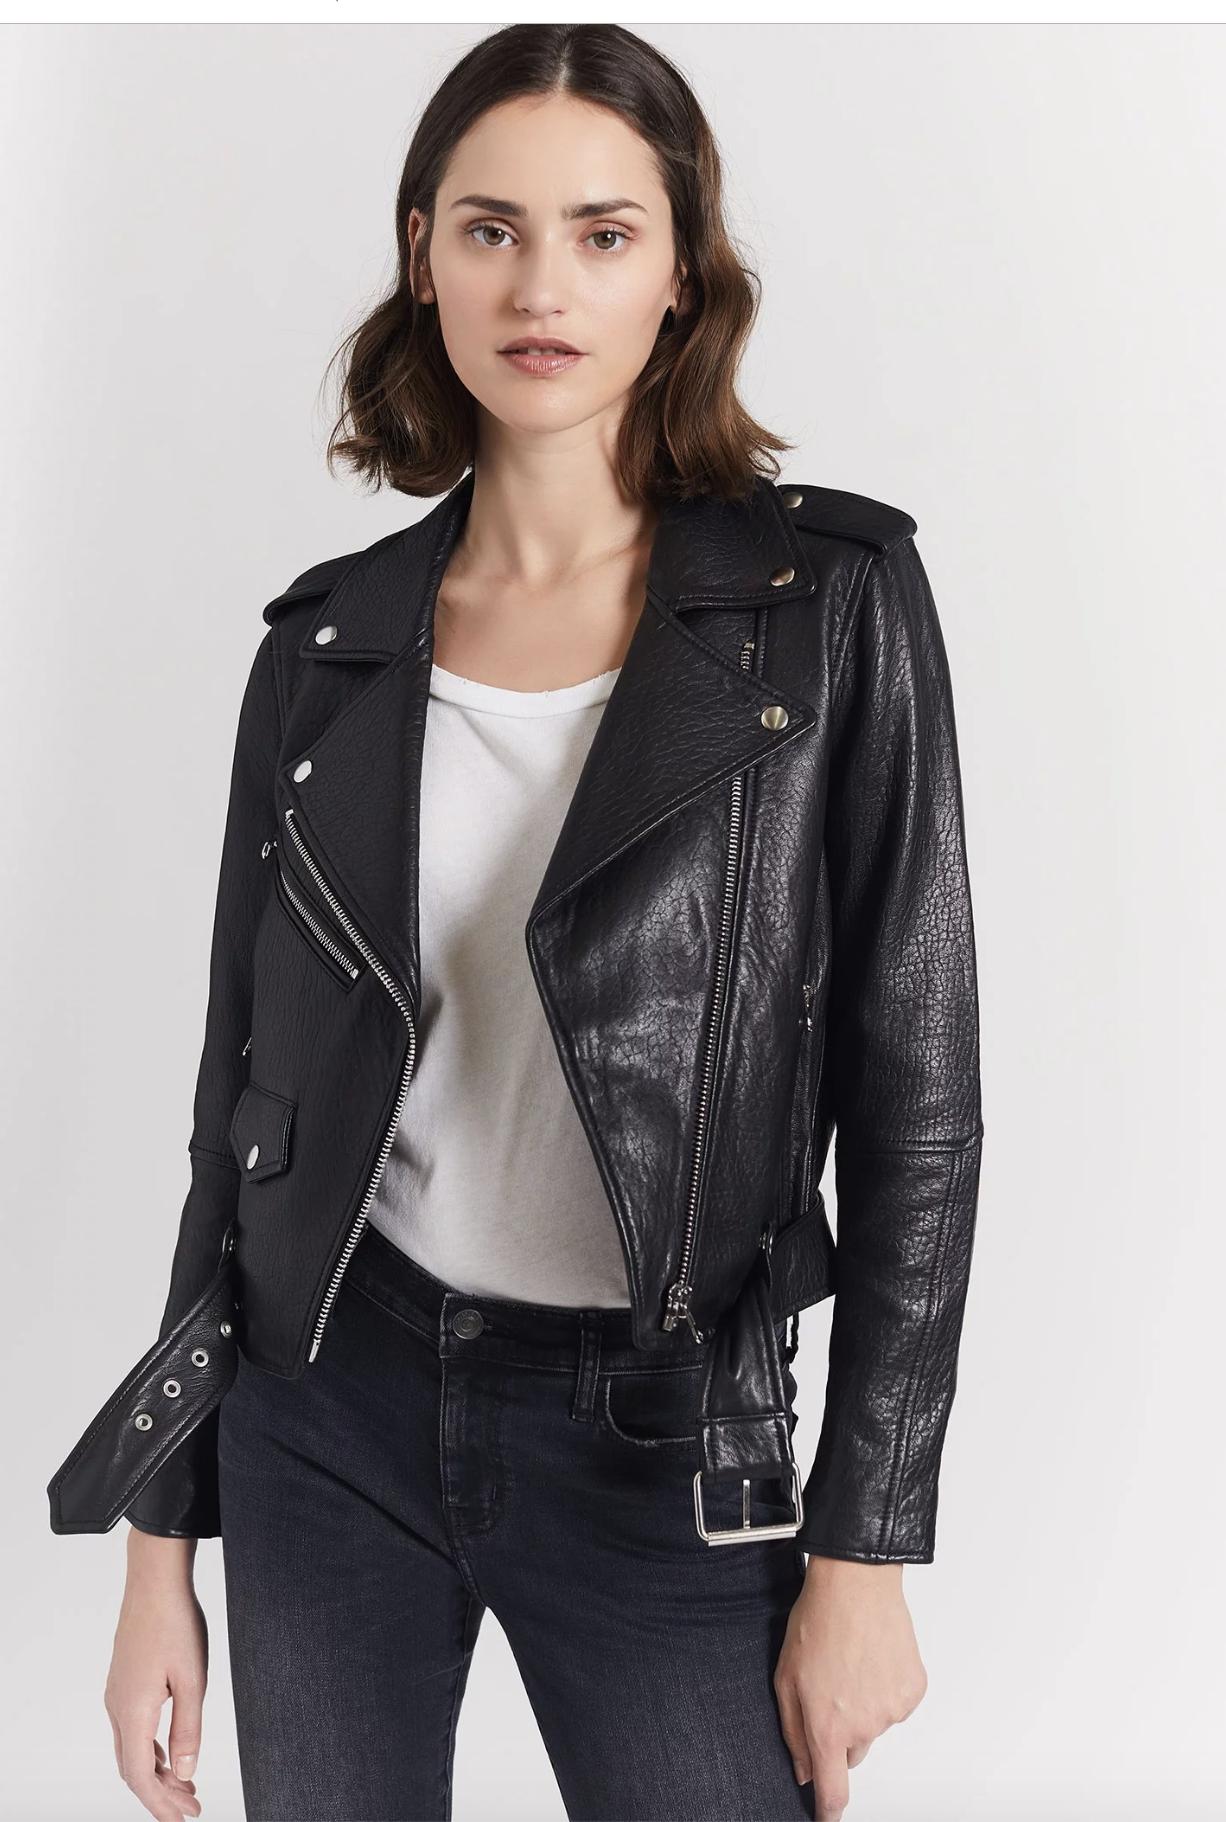 Current Elliot The Shaina Leather Biker Jacket, $1,198